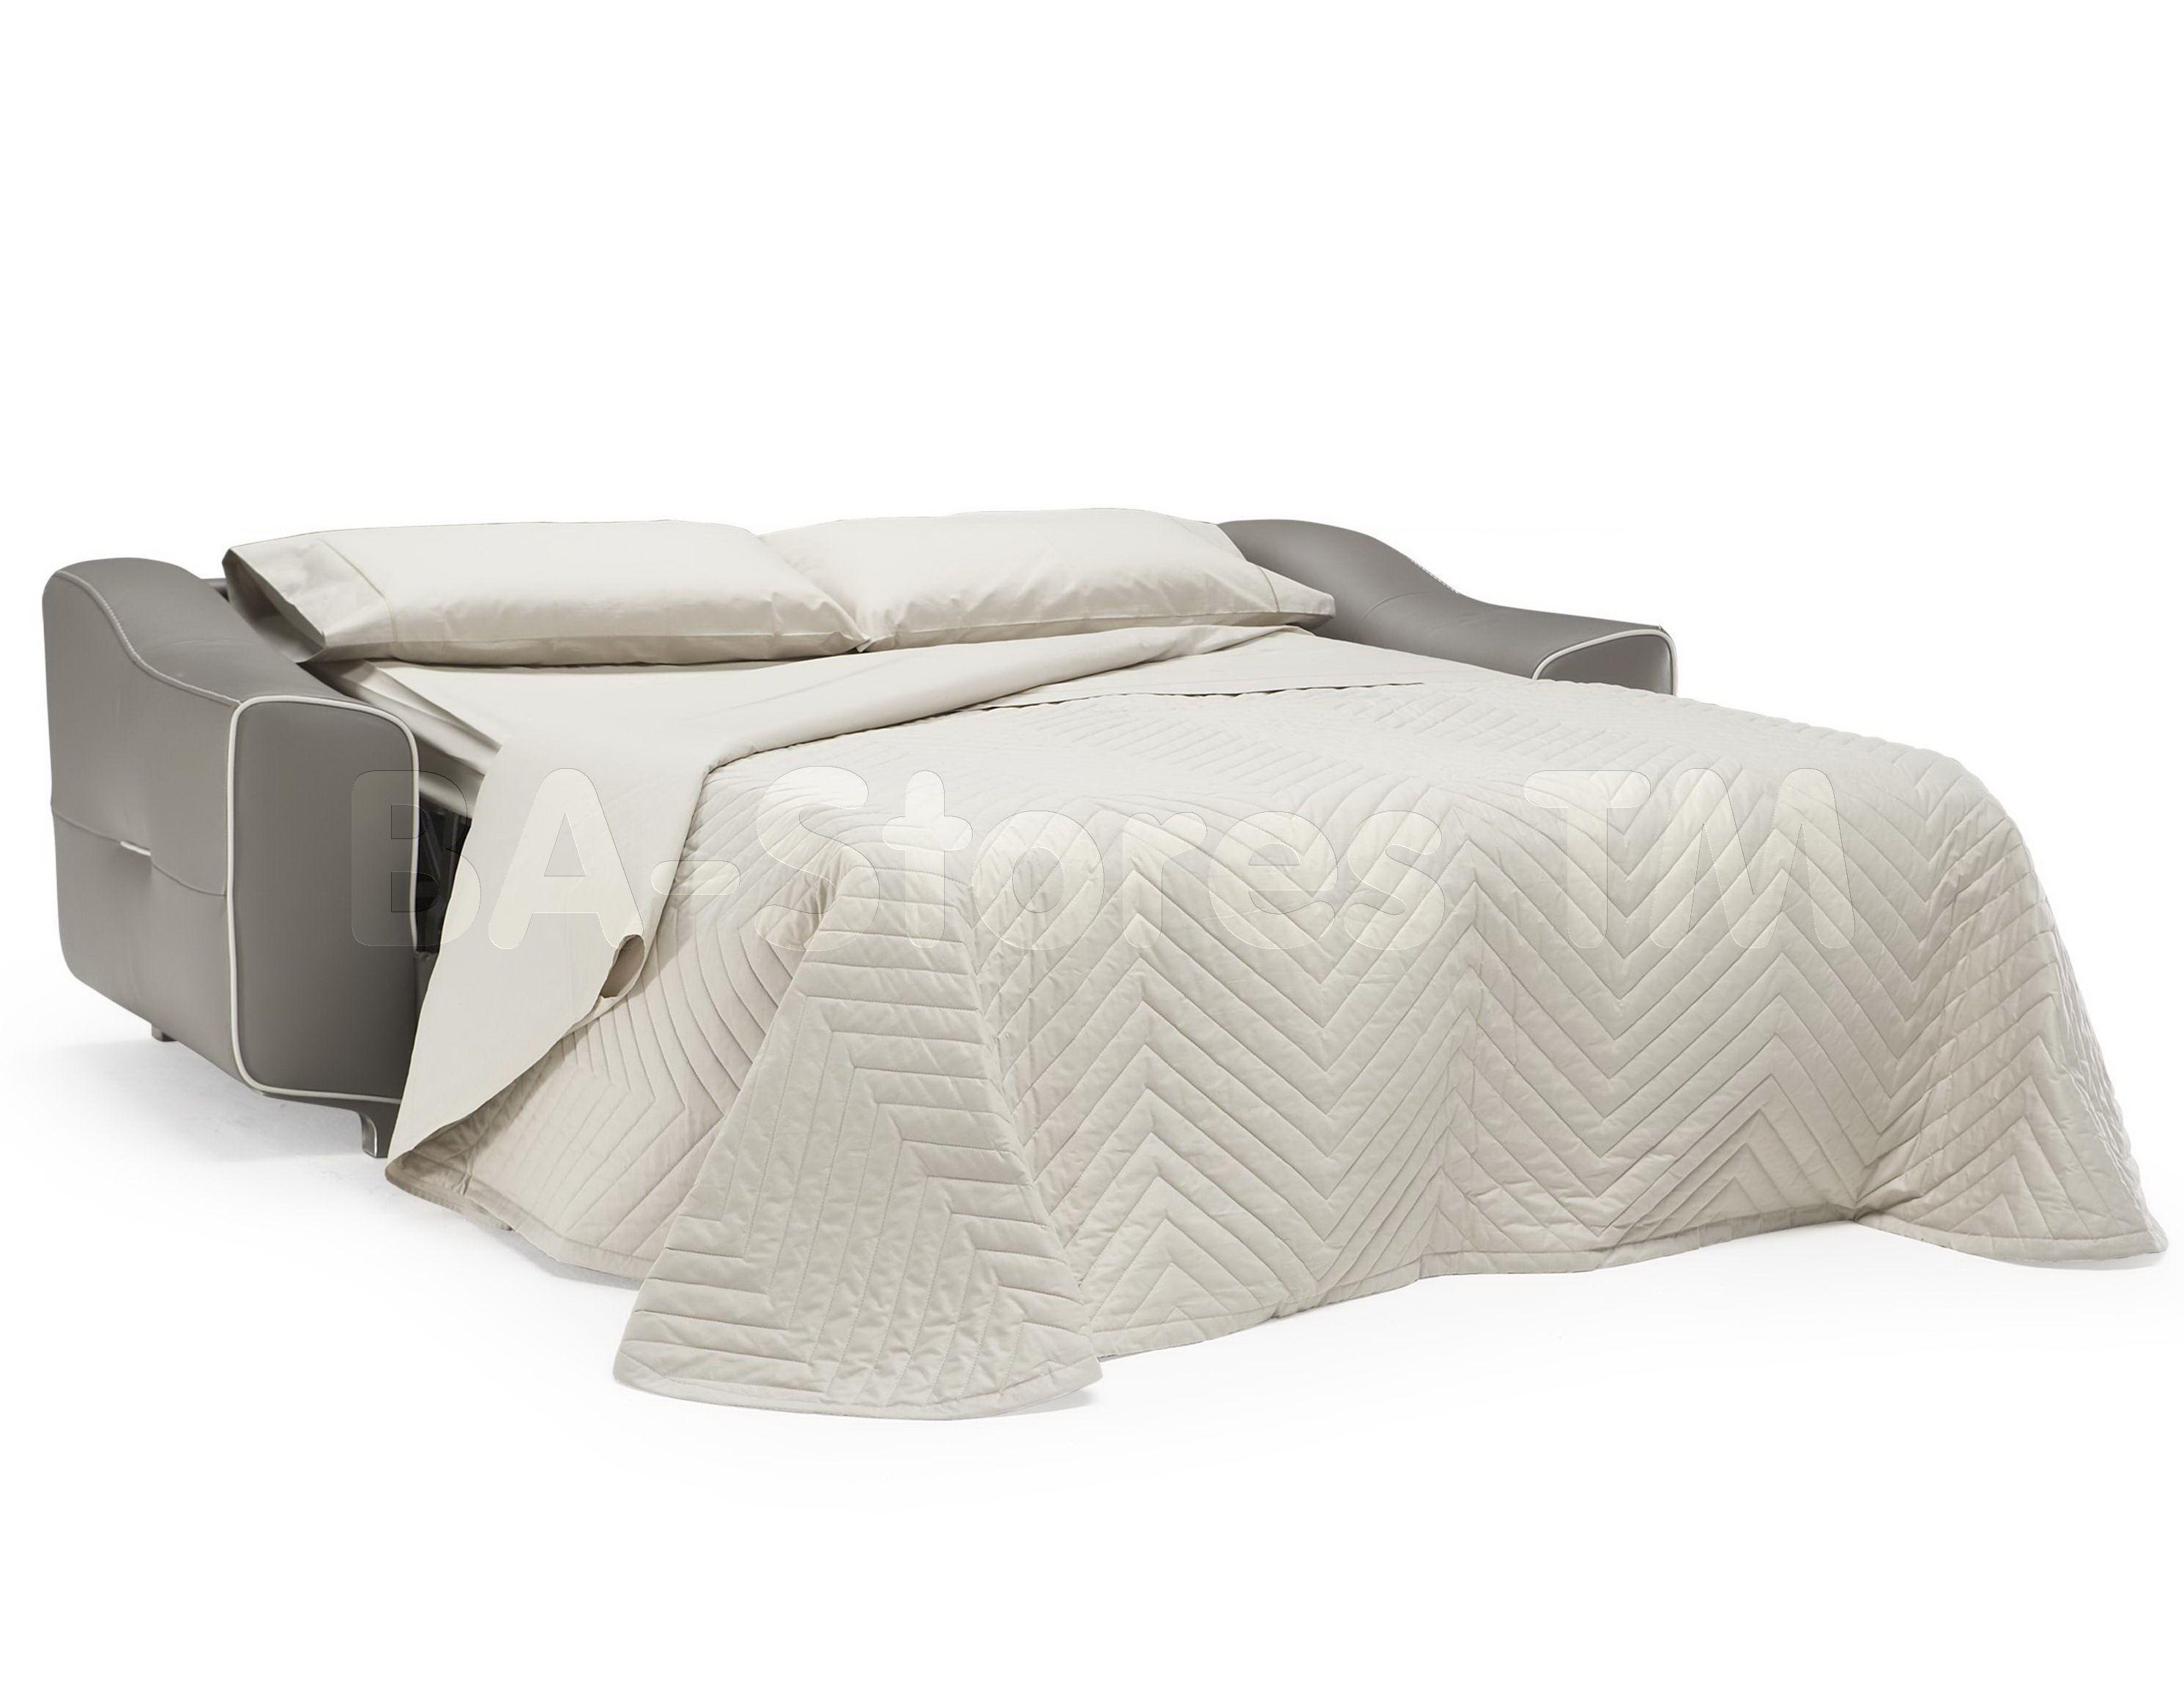 natuzzi editions contemporary leather sofa bed with mattress b816 rh pinterest com